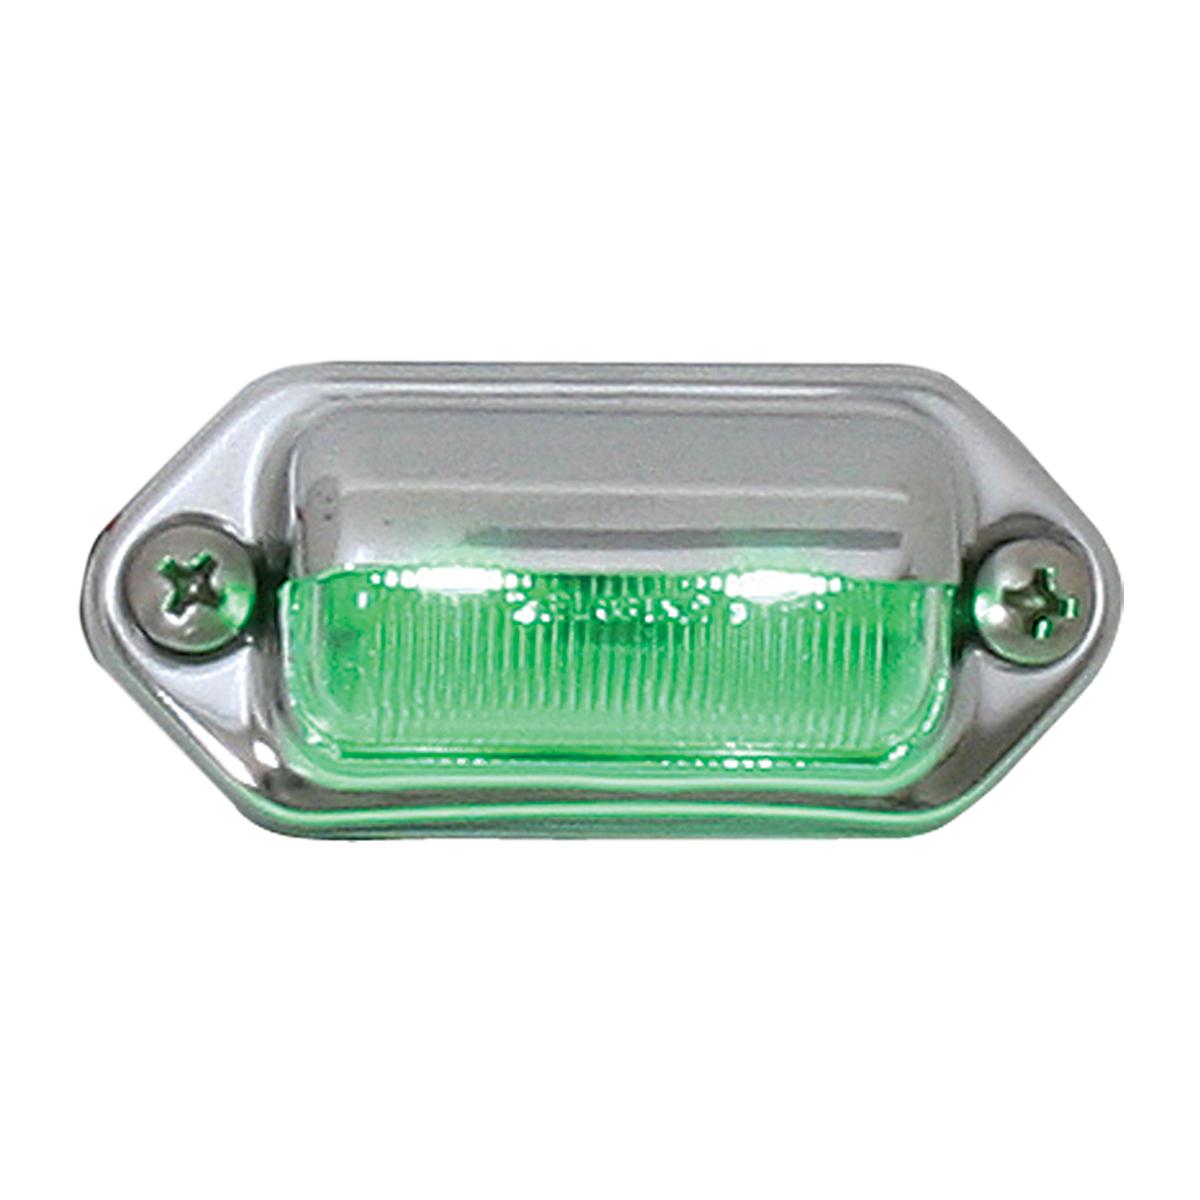 81732 Green Interior/Utility LED Light